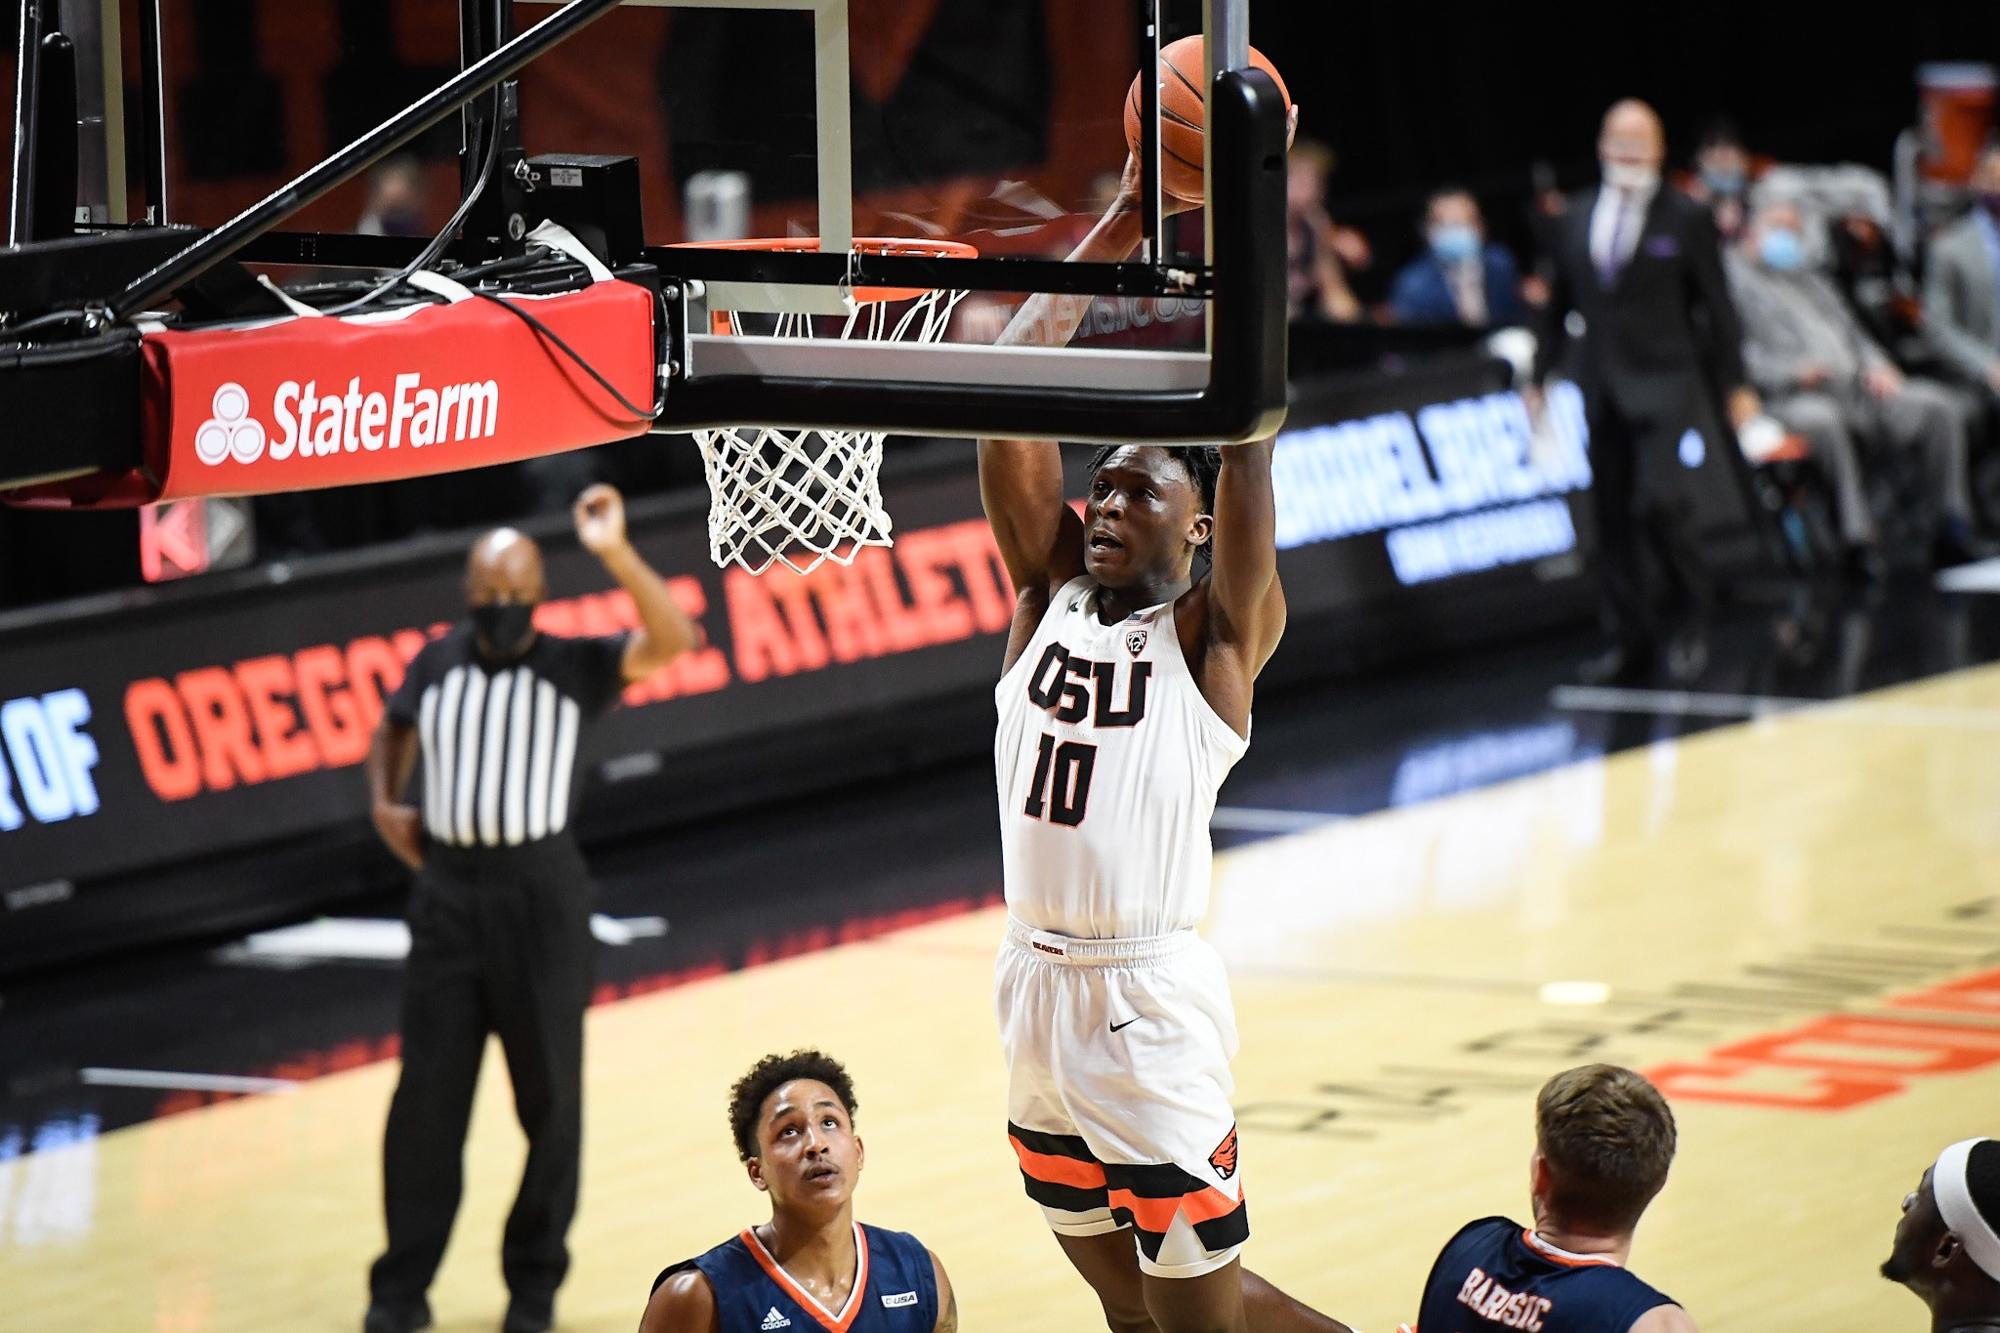 Oregon State's Warith Alatishe, an under-the-radar prospect who emerges as  an elite college basketball rebounder - oregonlive.com